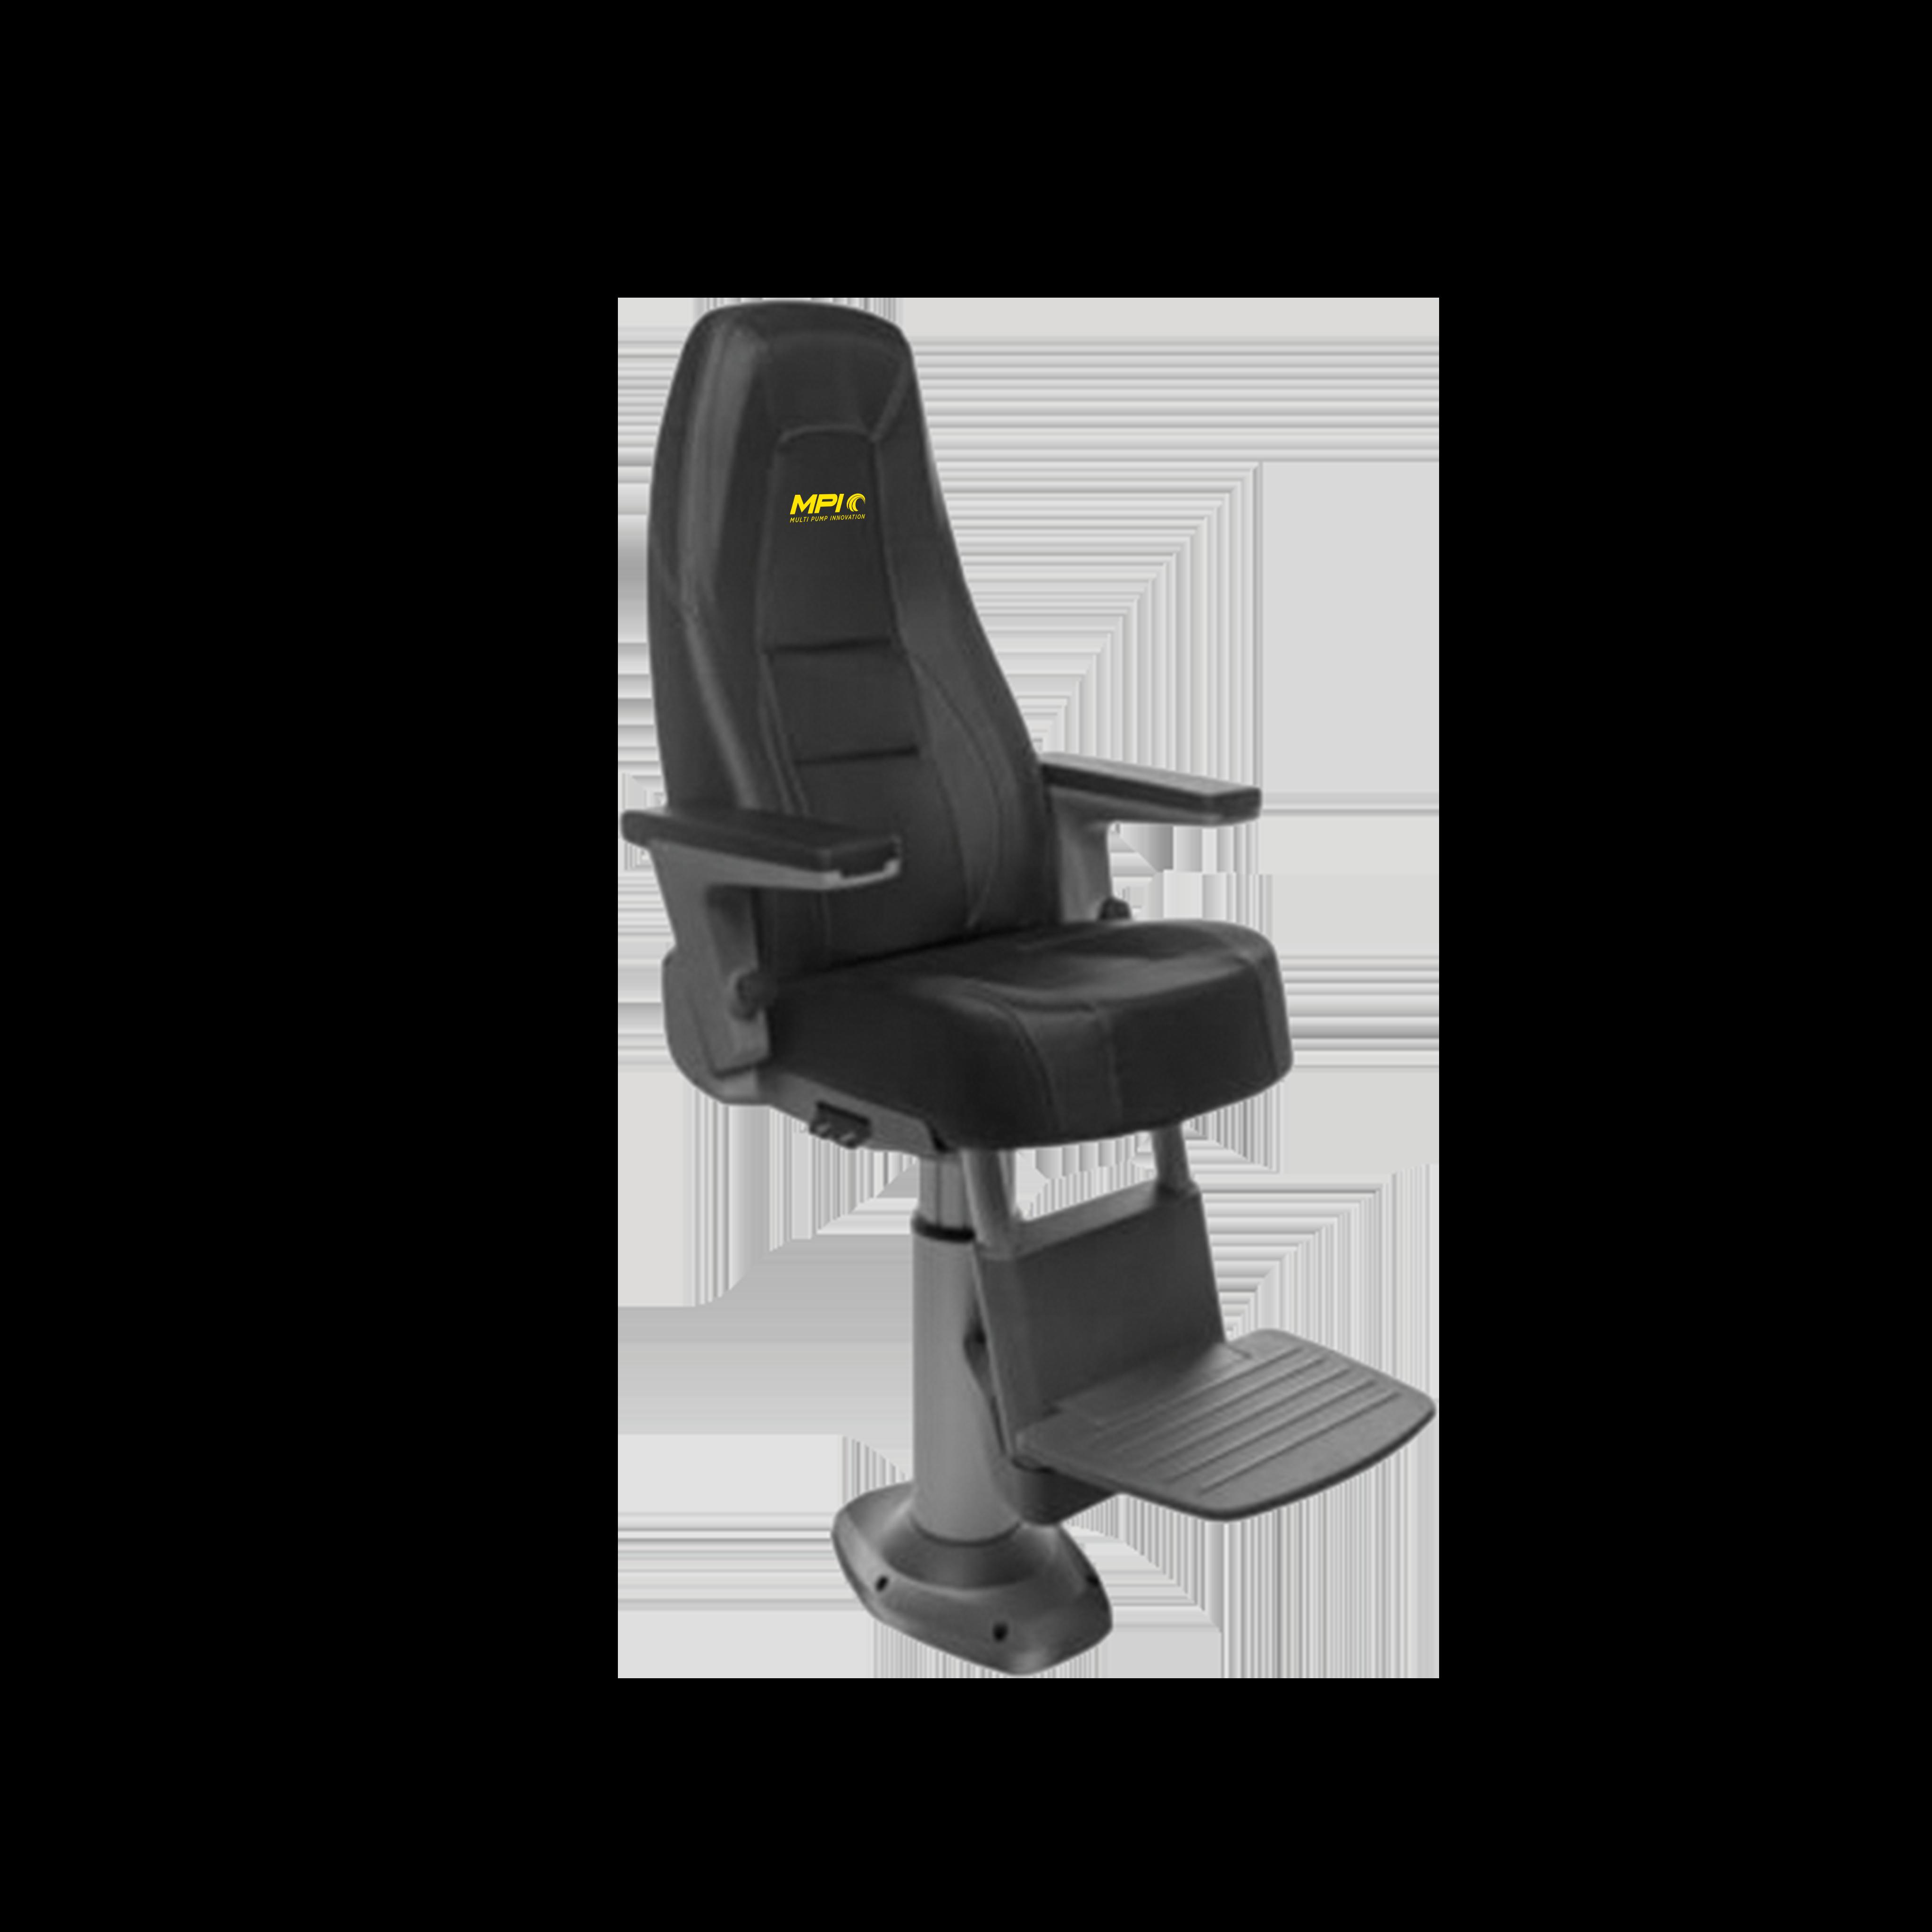 Pilotchair